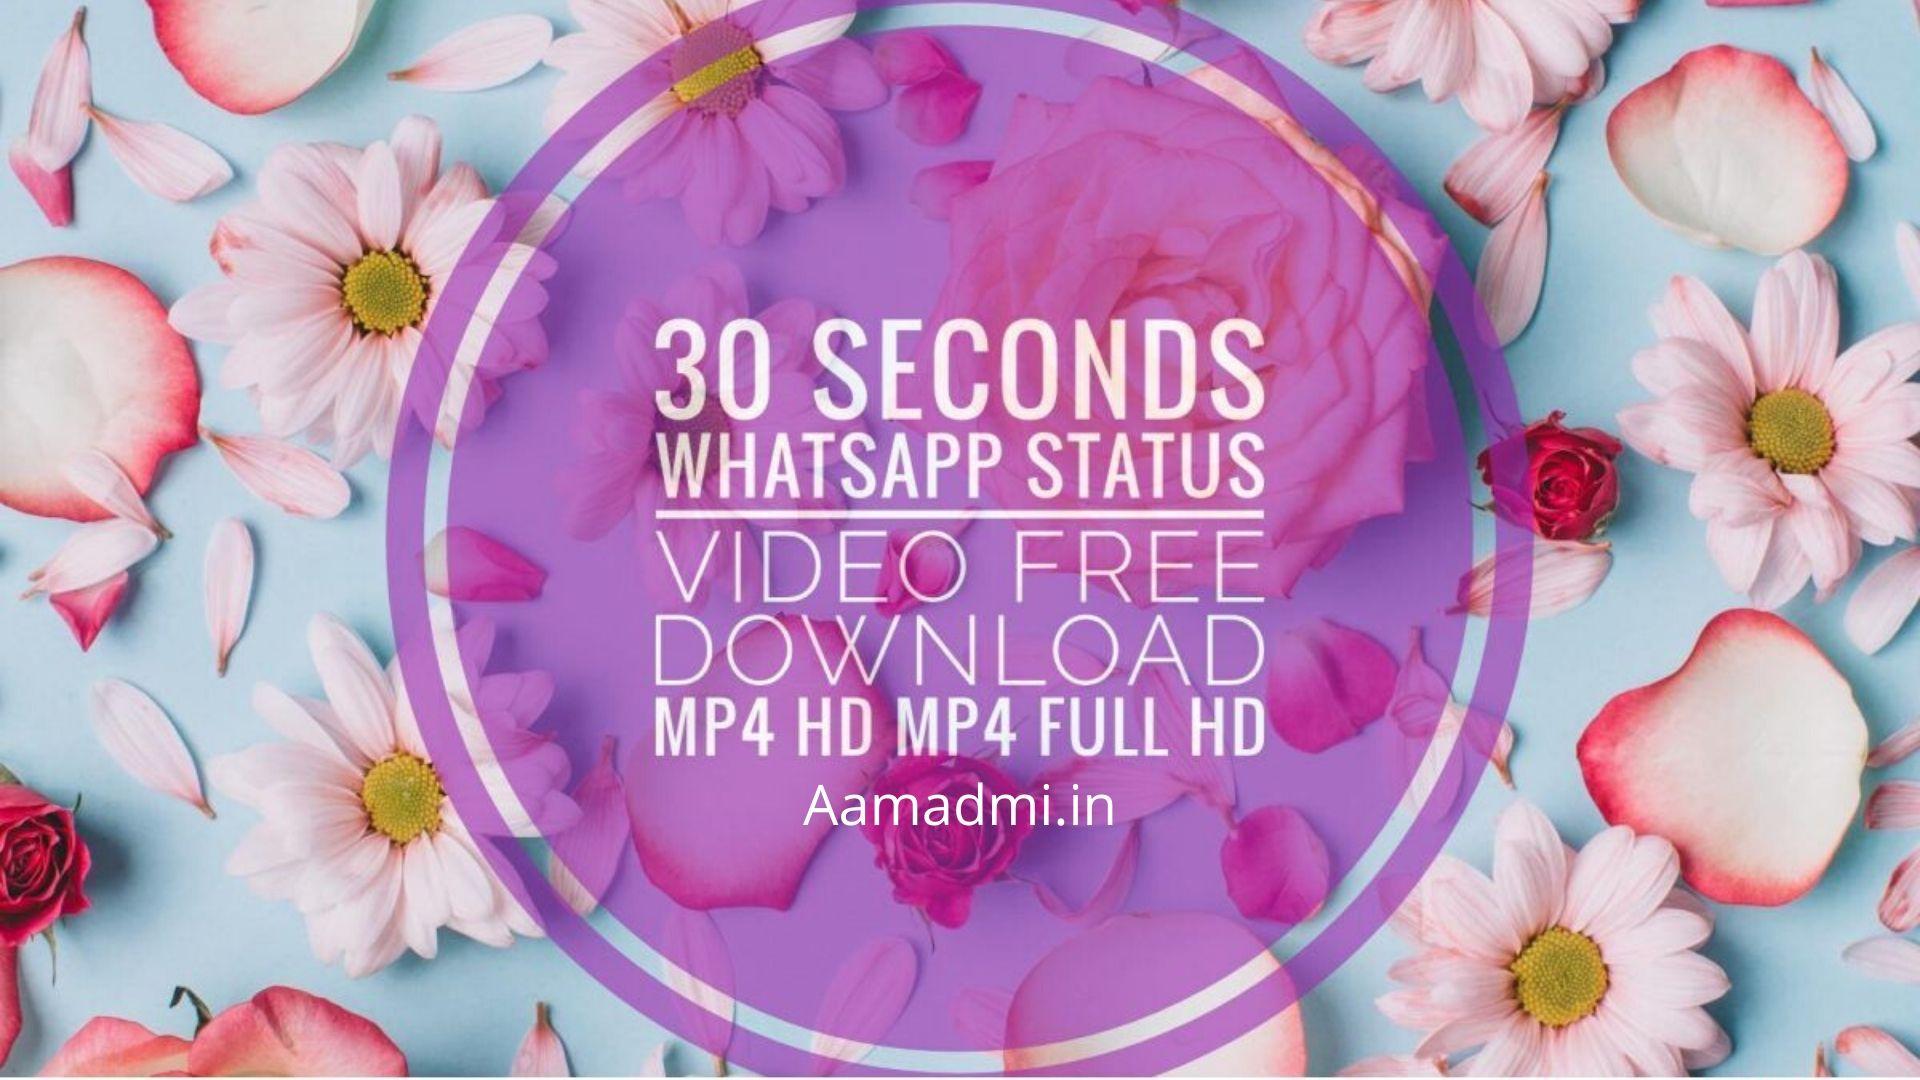 30 Seconds Latest Whatsapp Status Video Free Download 2019